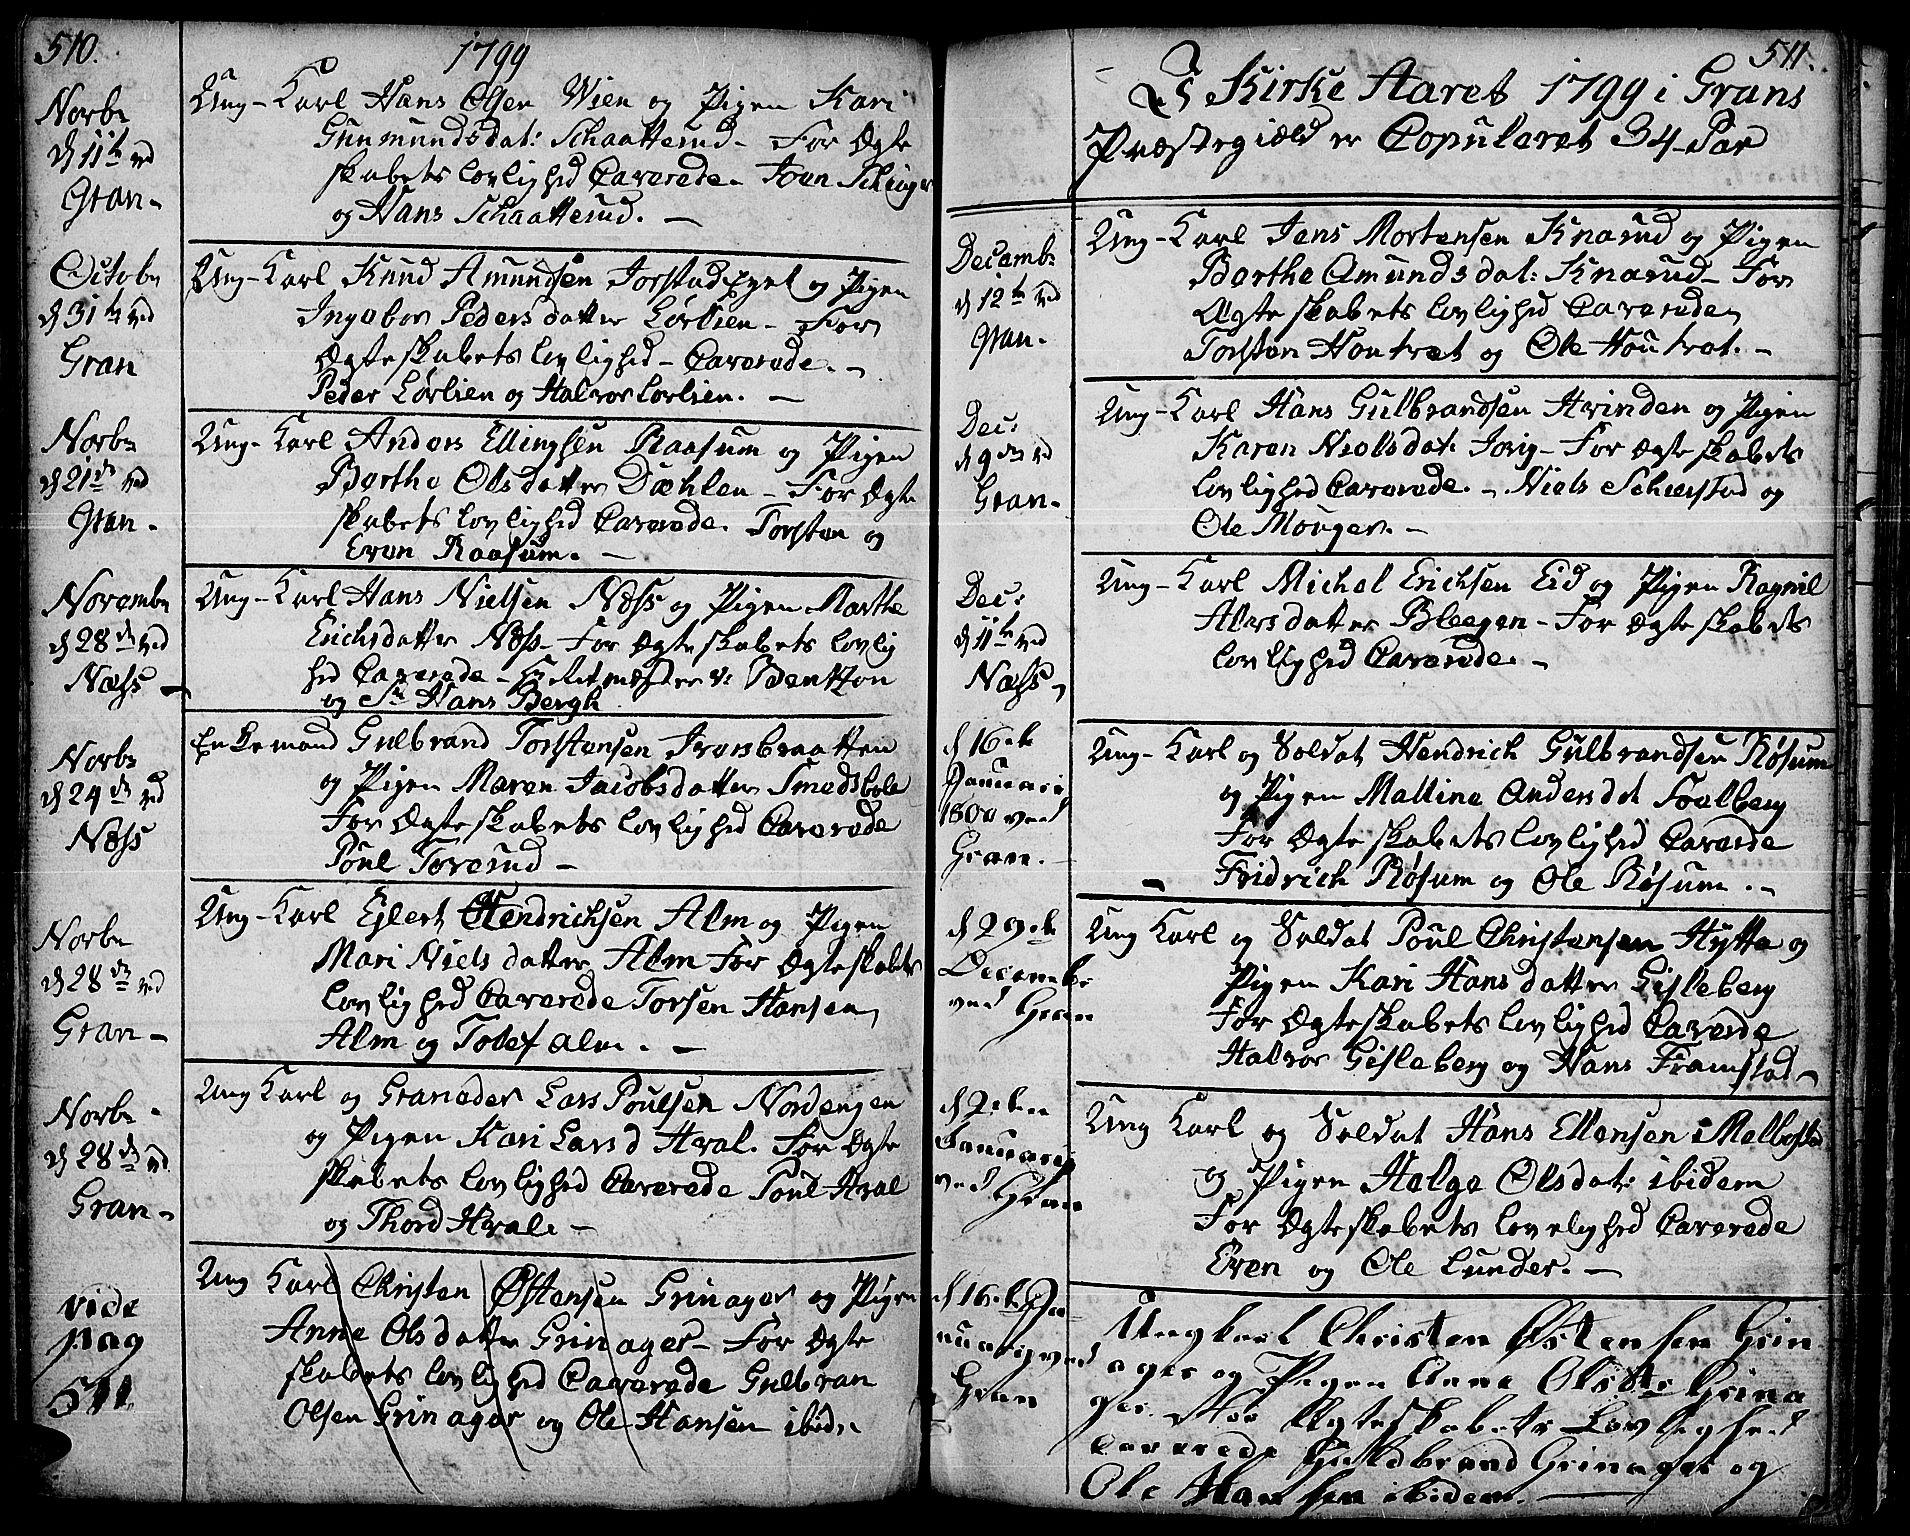 SAH, Gran prestekontor, Ministerialbok nr. 6, 1787-1824, s. 510-511